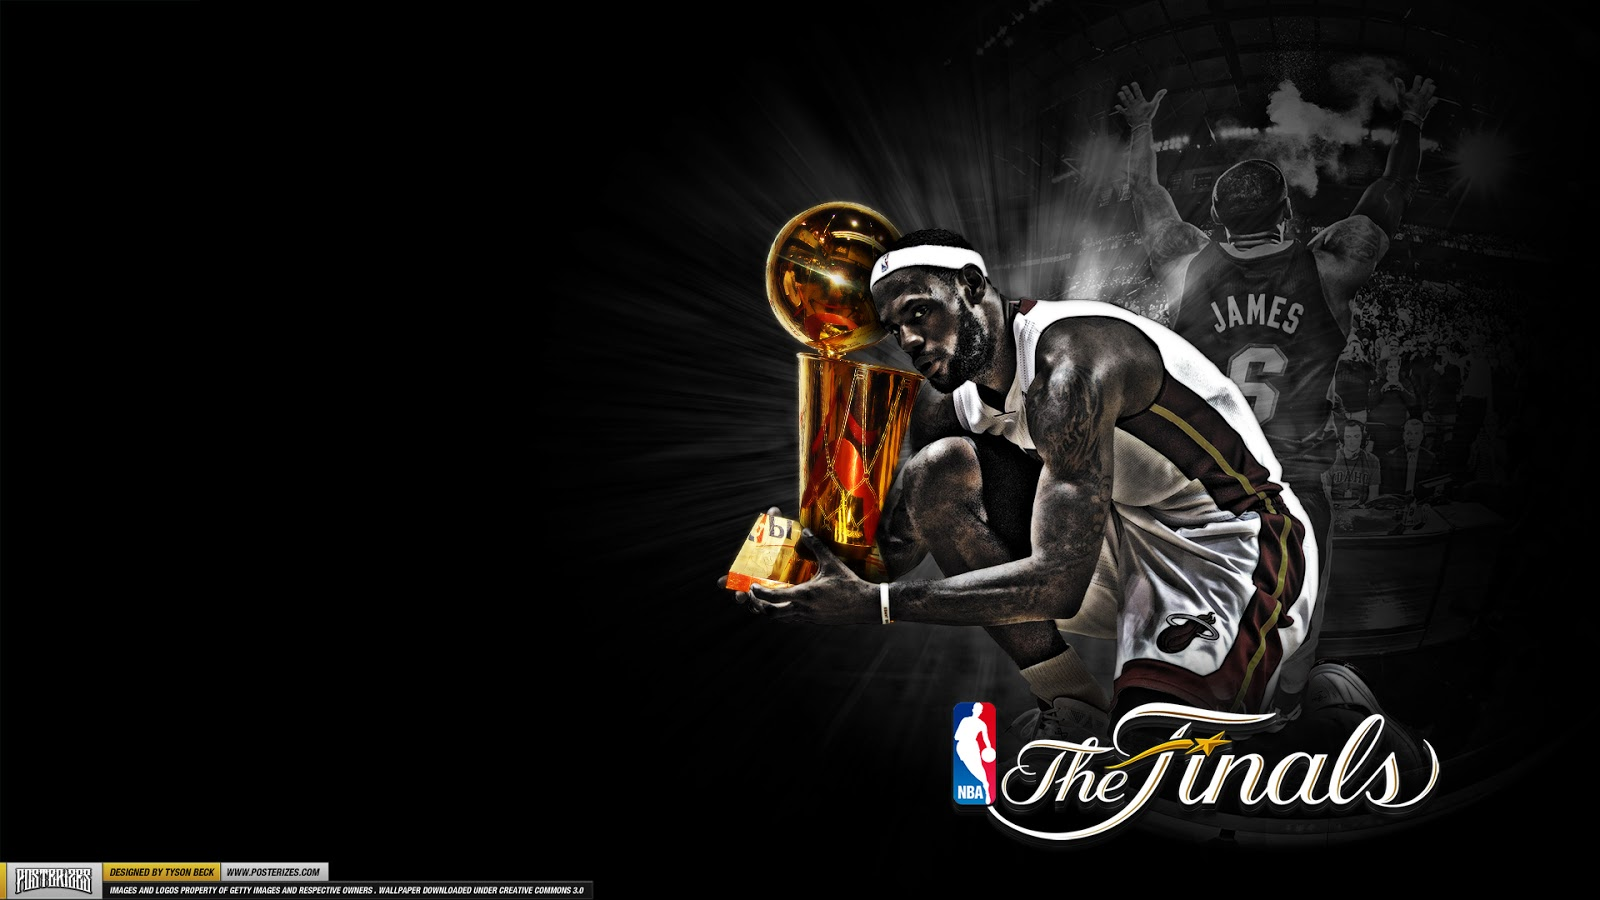 Miami Heat 2013 NBA Champions Wallpaper LeBron James Championship 1600x900